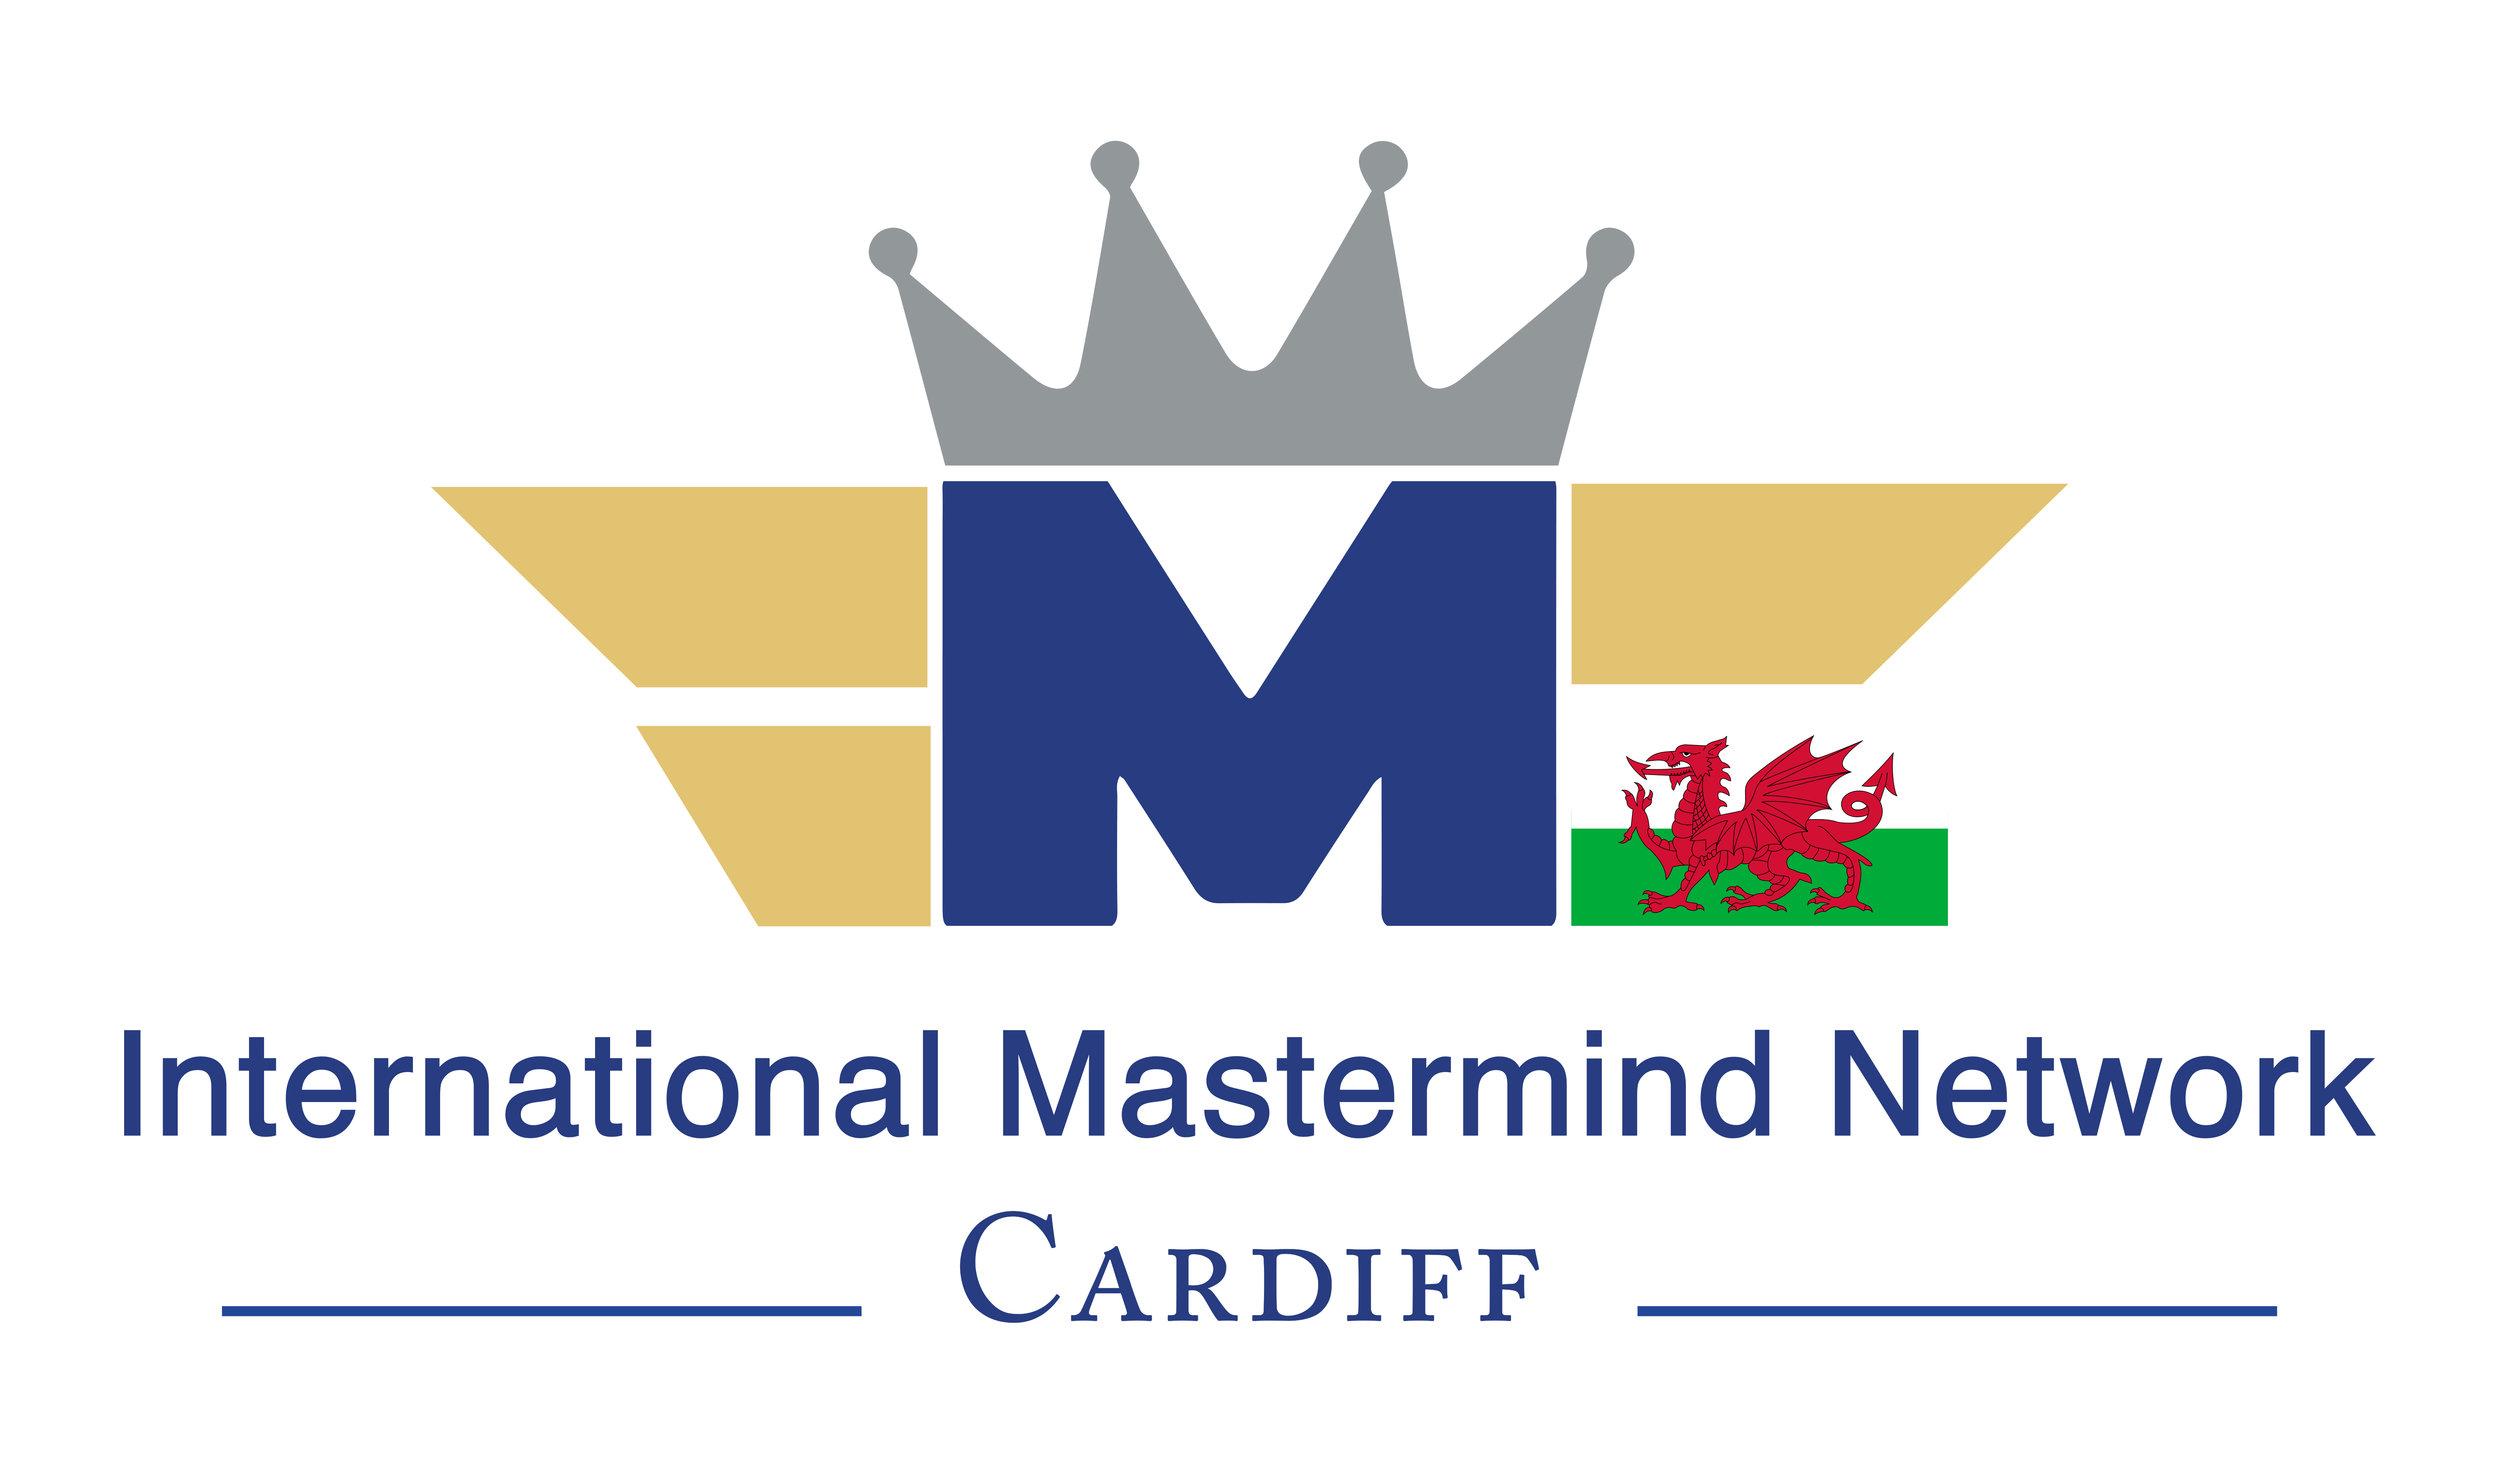 IMN-Cardiff-Logo jpg.jpg